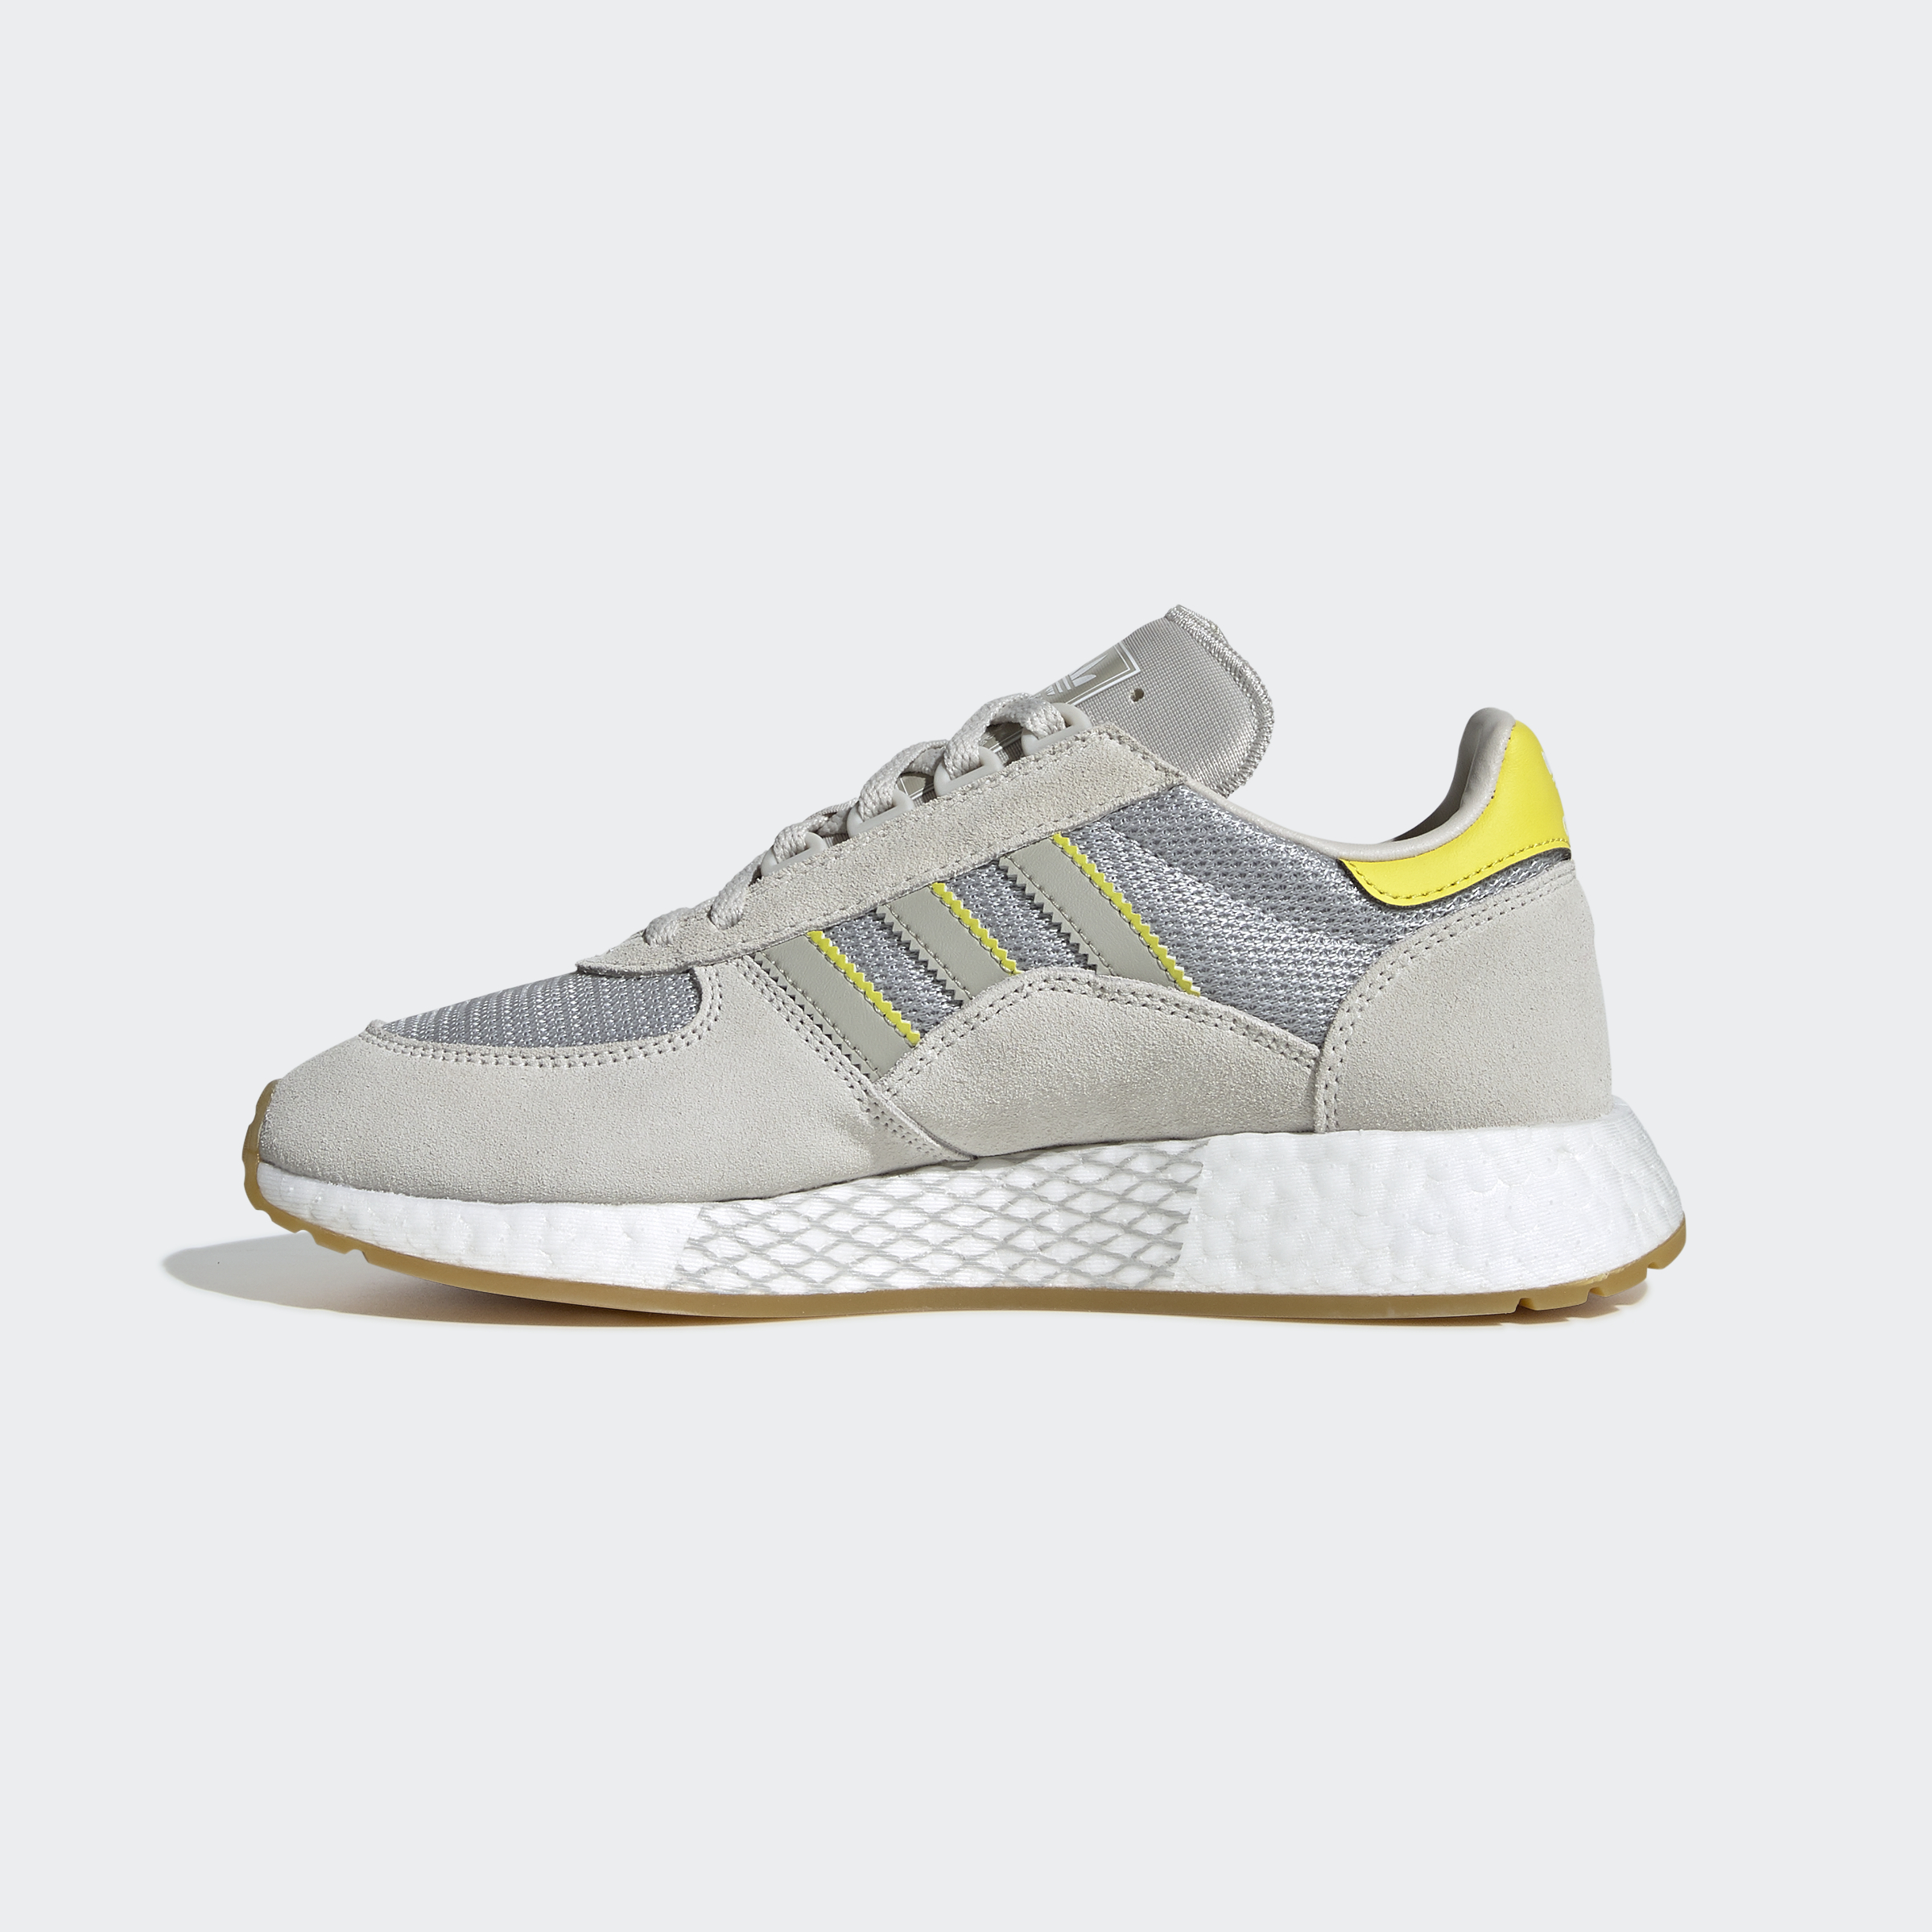 adidas-Marathon-Tech-Shoes-Women-039-s-Athletic-amp-Sneakers thumbnail 17